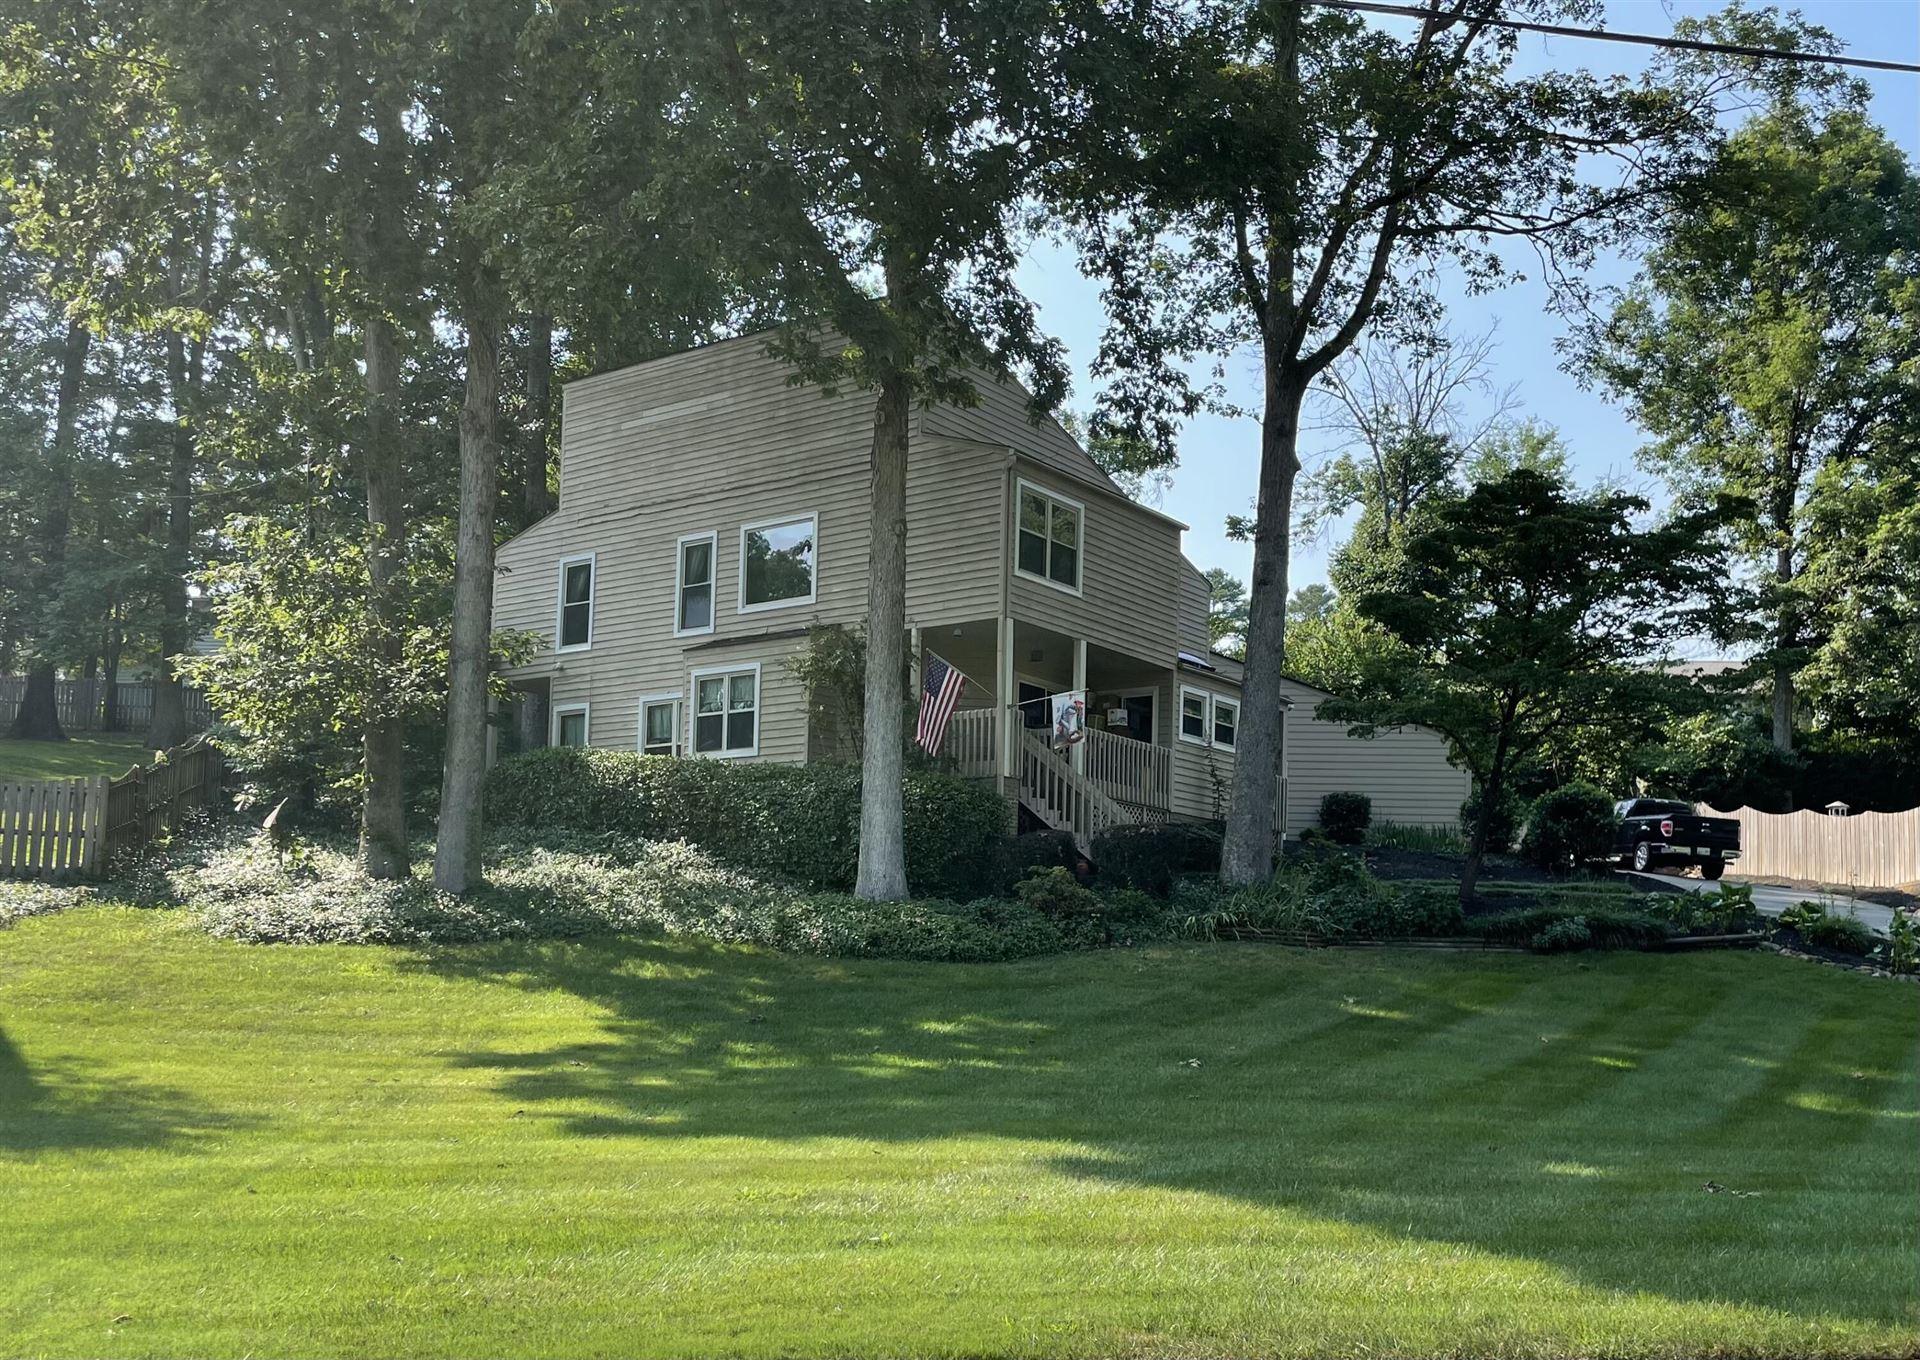 Photo of 12111 Creekwood Terrace, Knoxville, TN 37934 (MLS # 1162213)